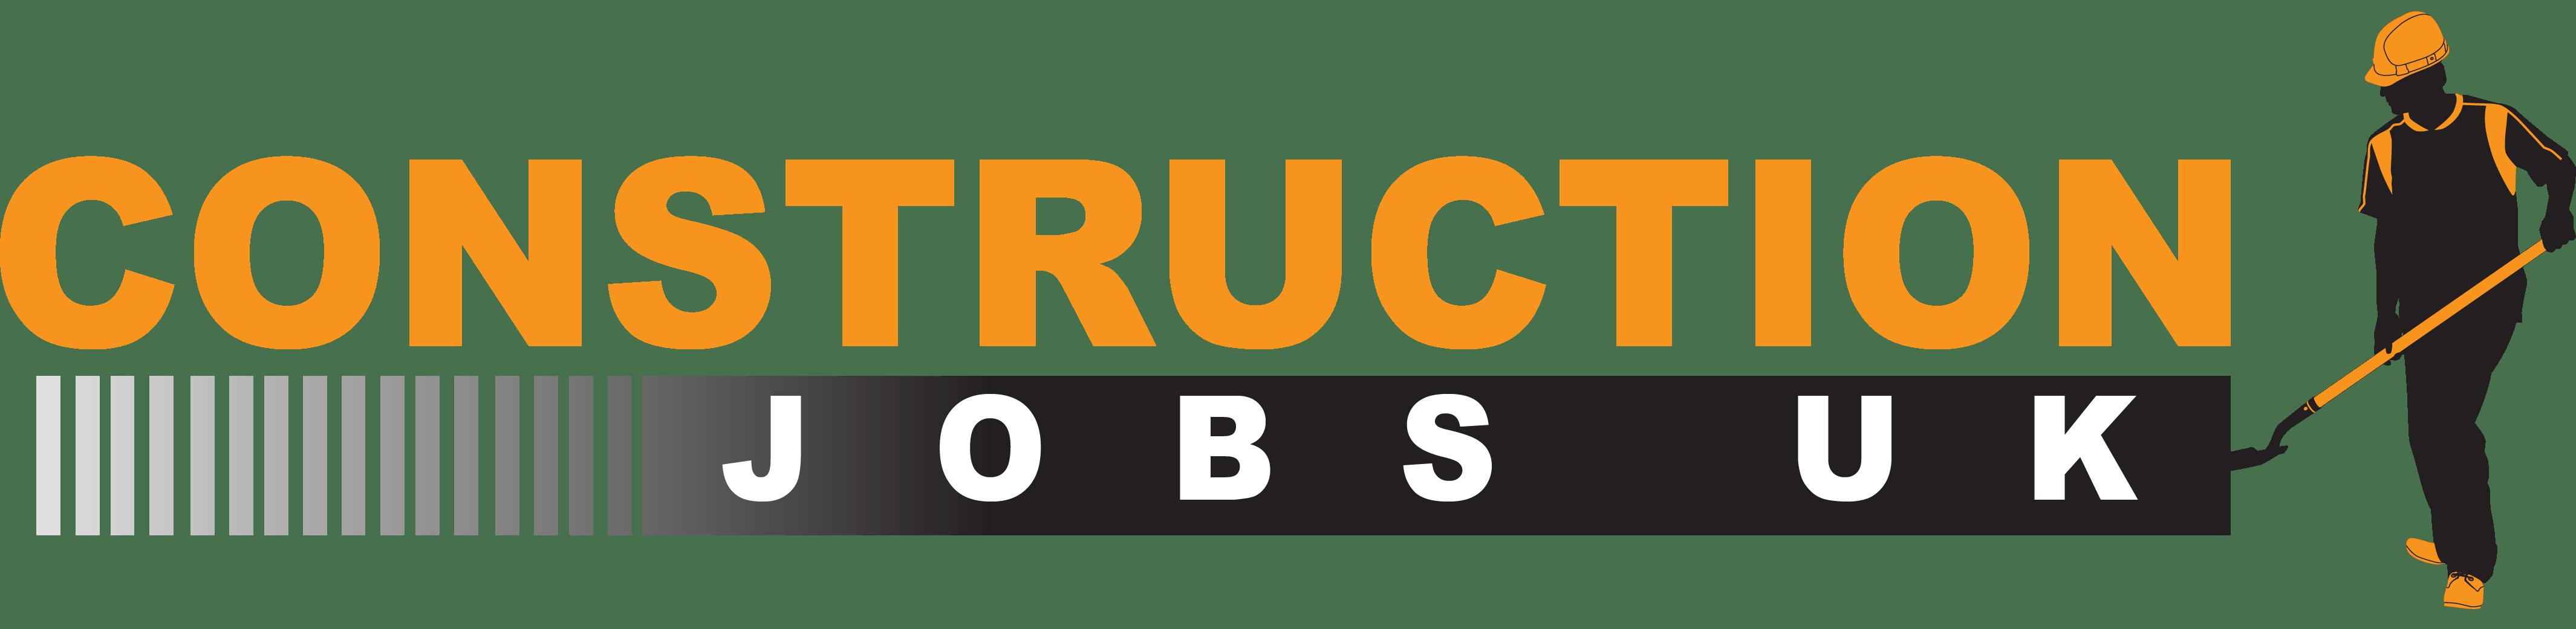 uk construction jobs uk construction jobs archinect